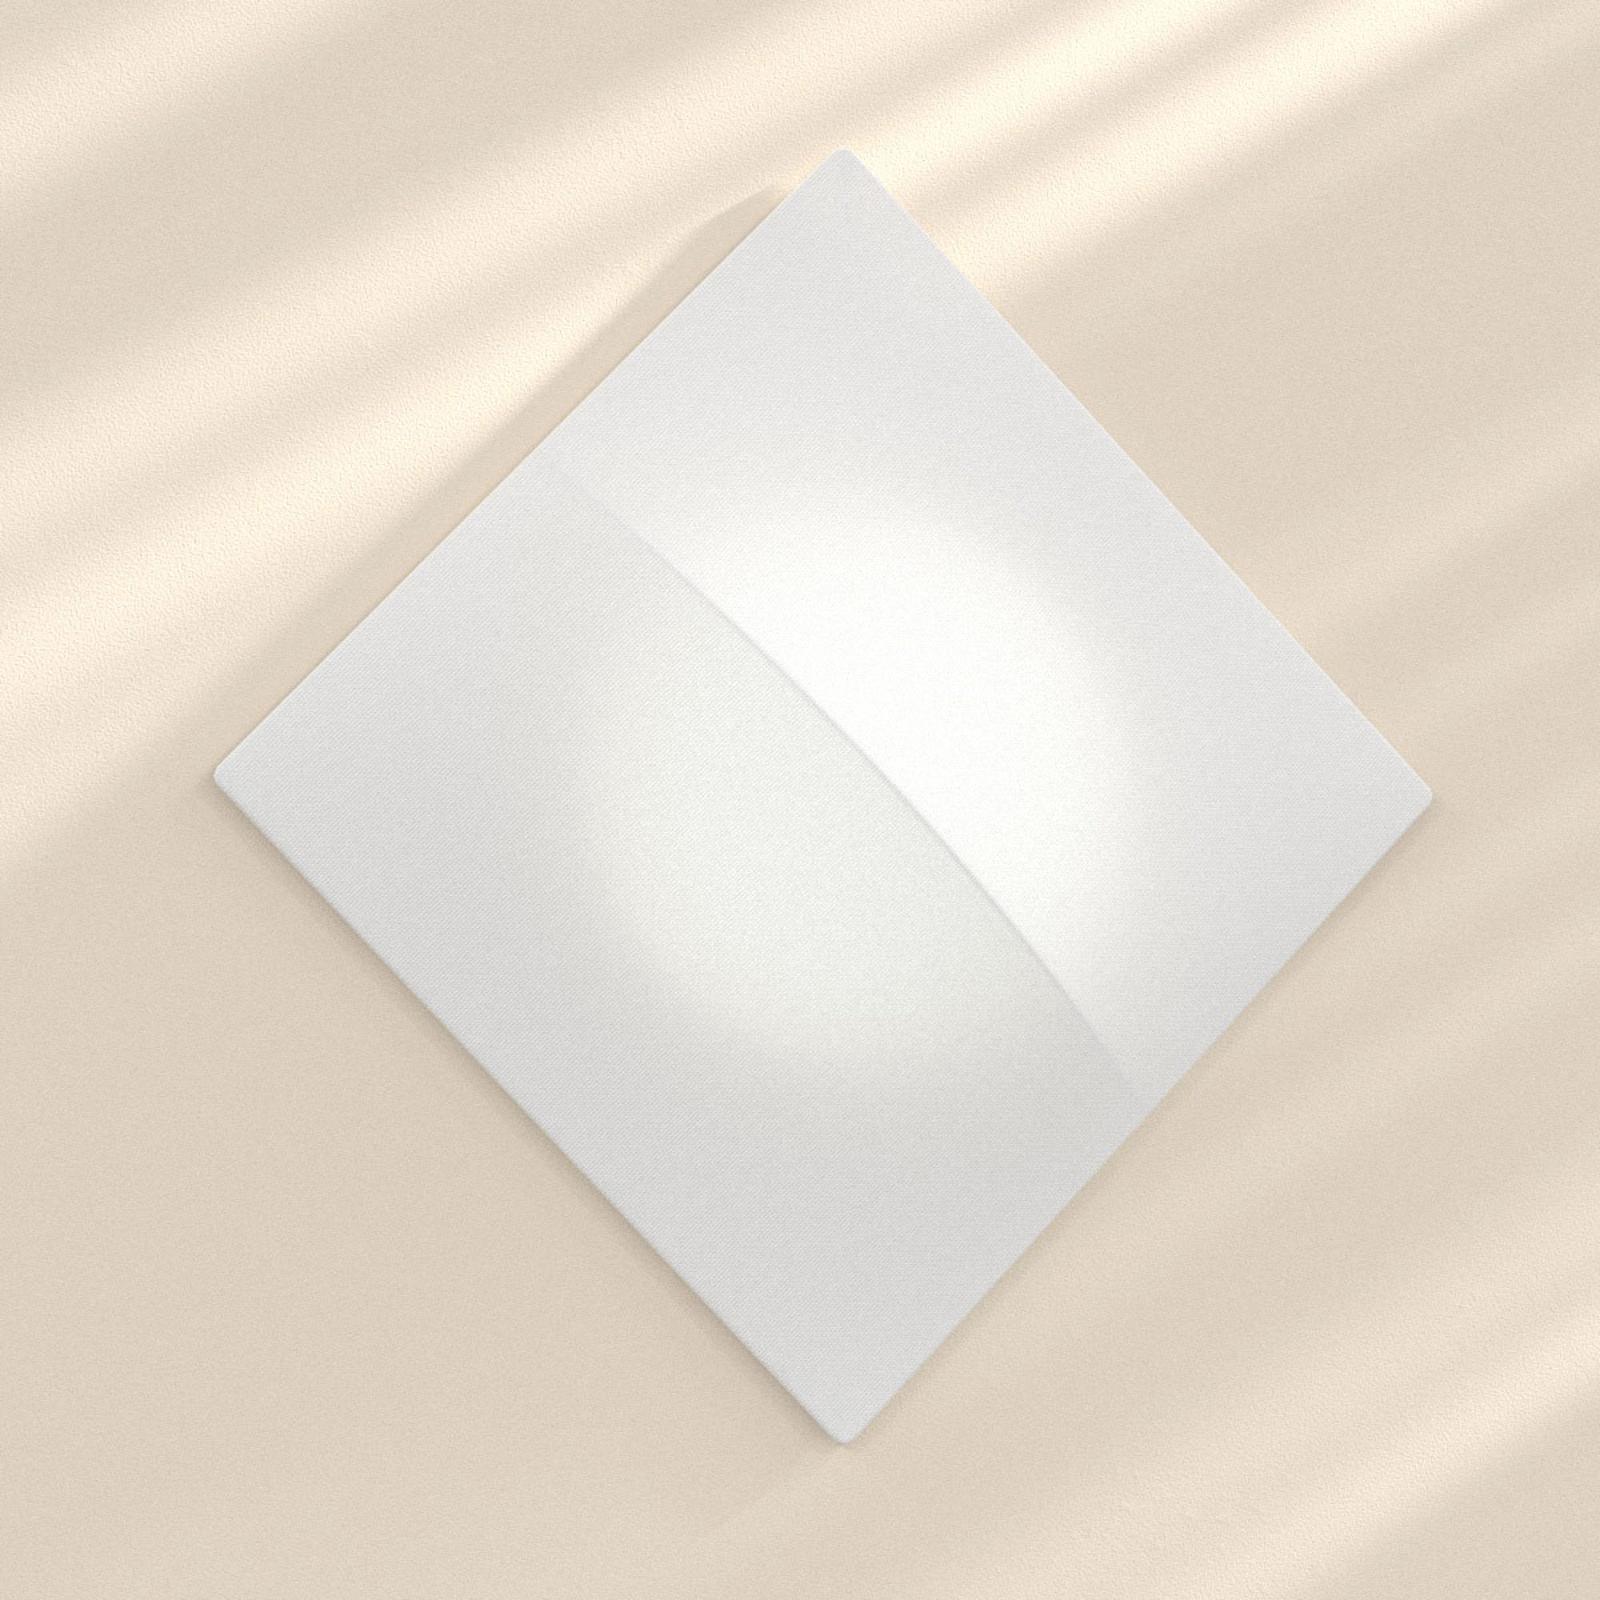 Nelly S - firkantet vegglampe med stoff, 100cm